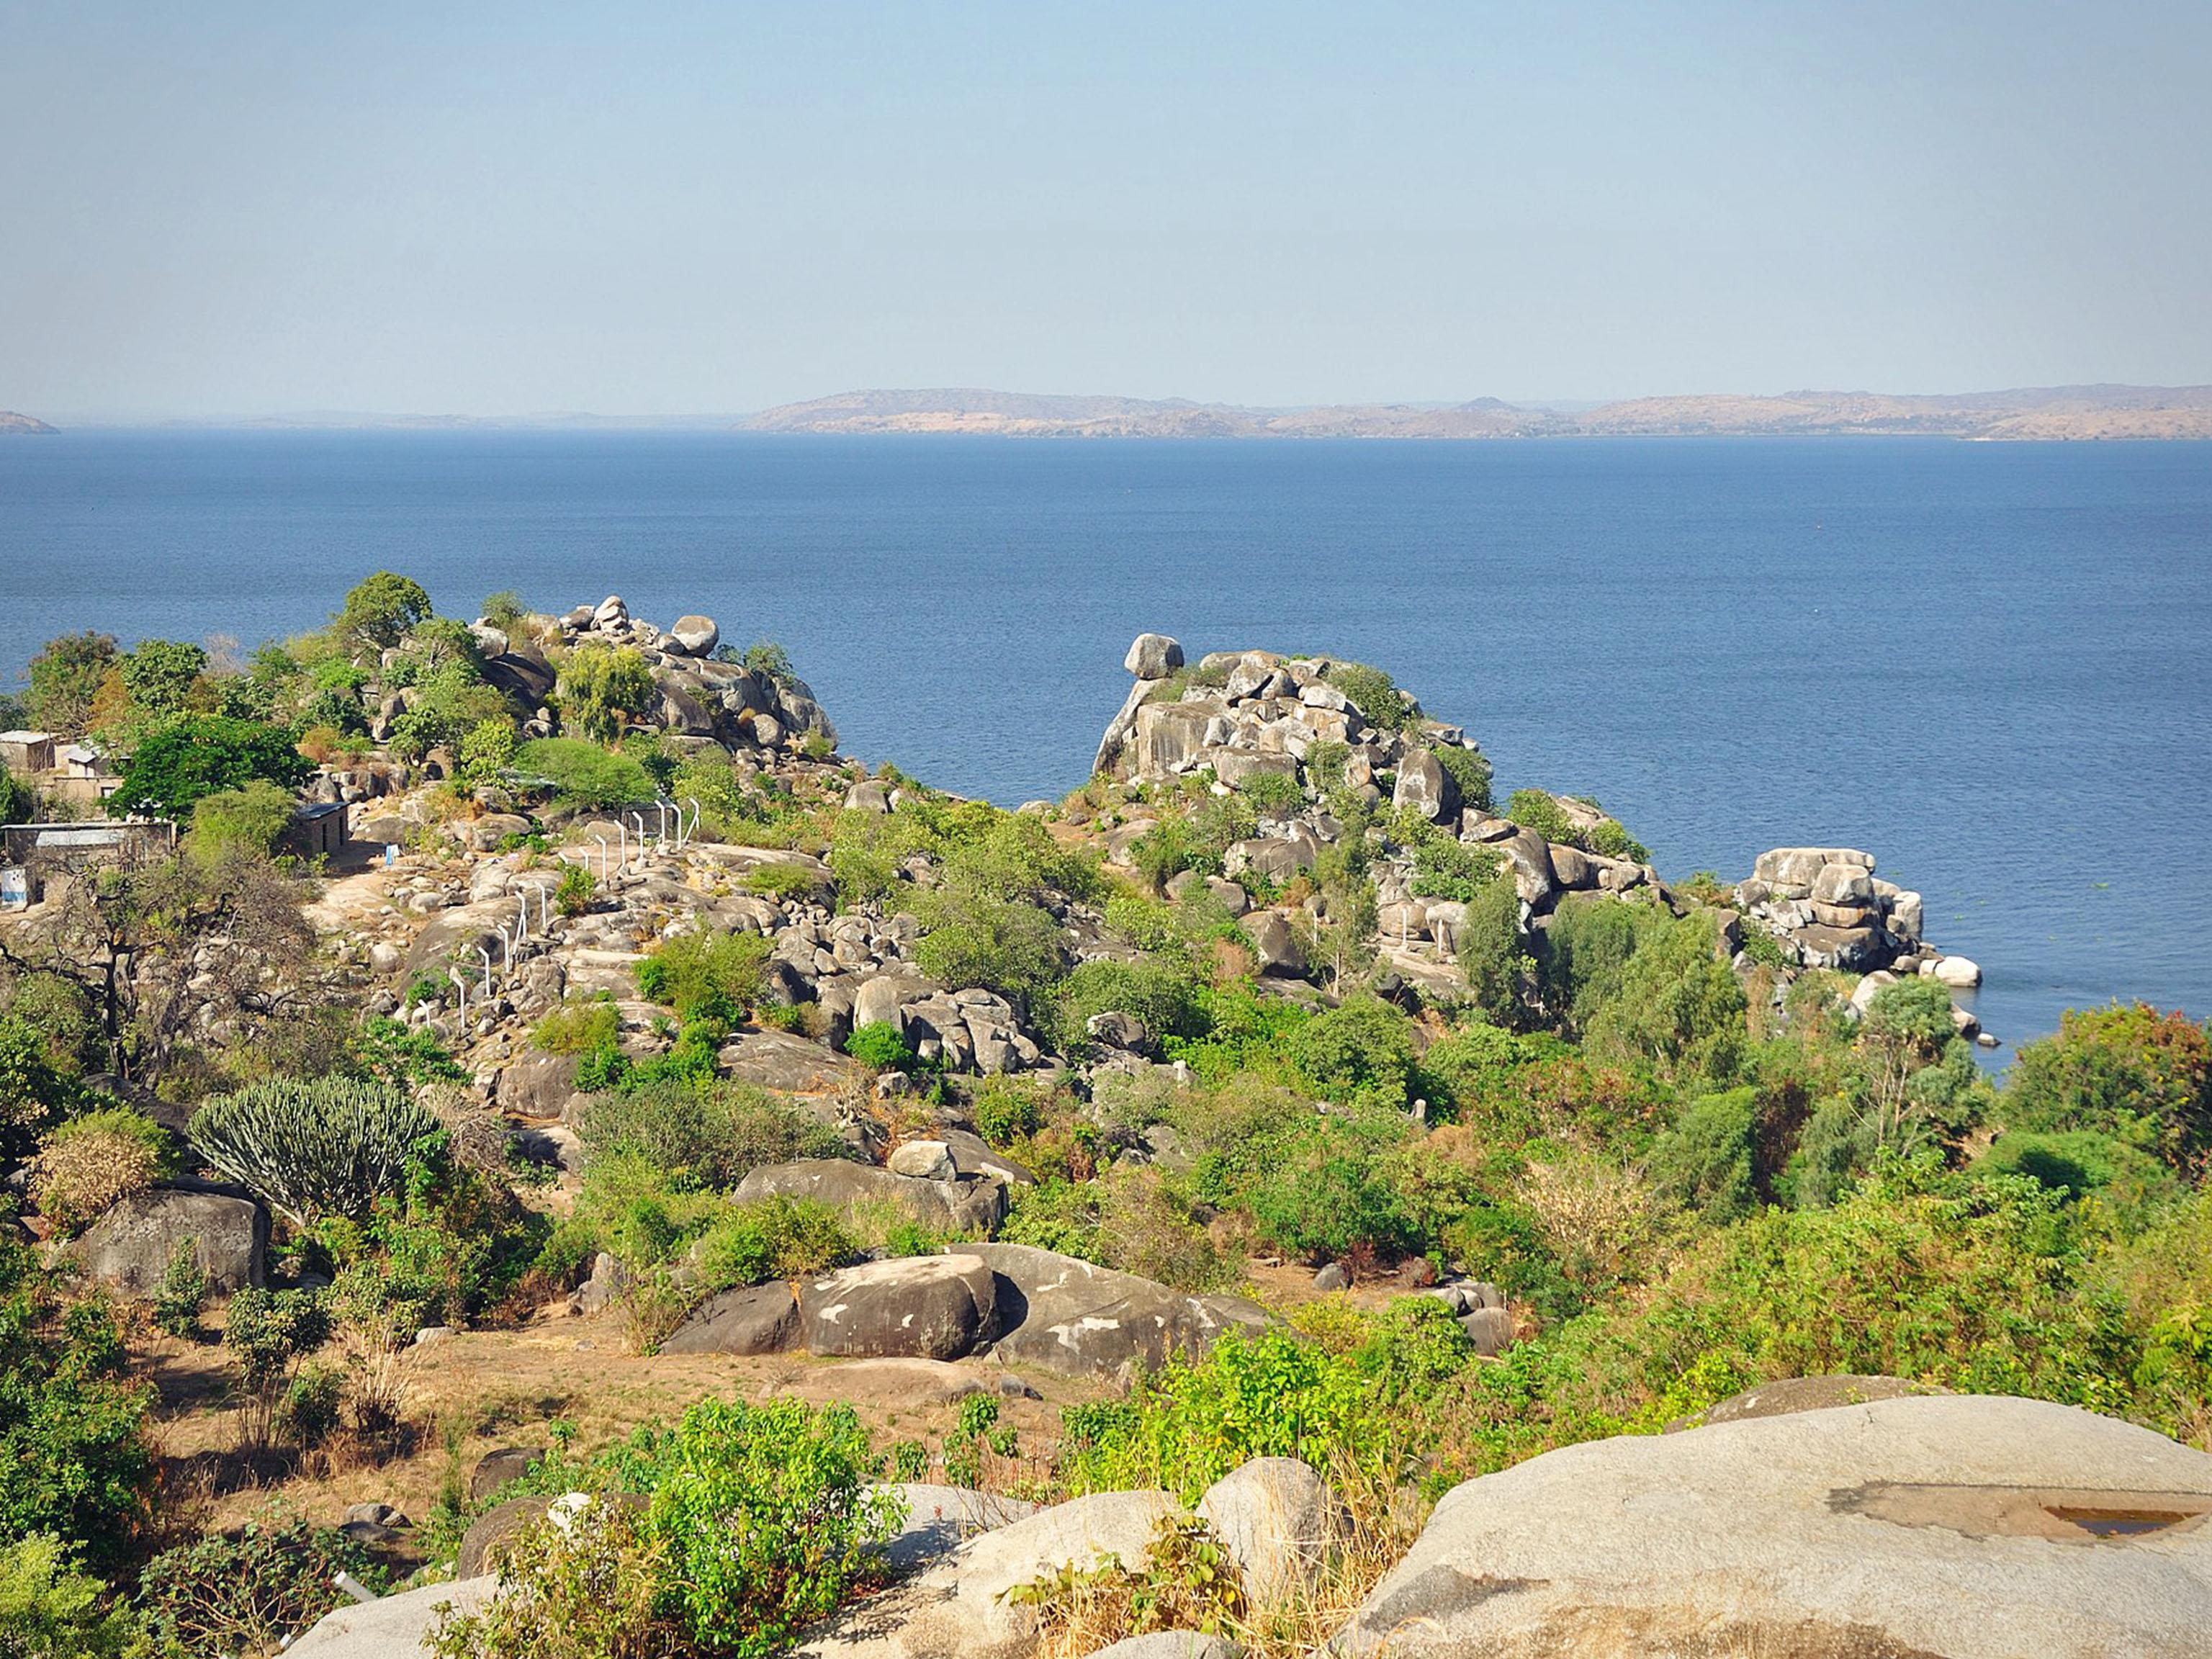 Mwanza Tanzania